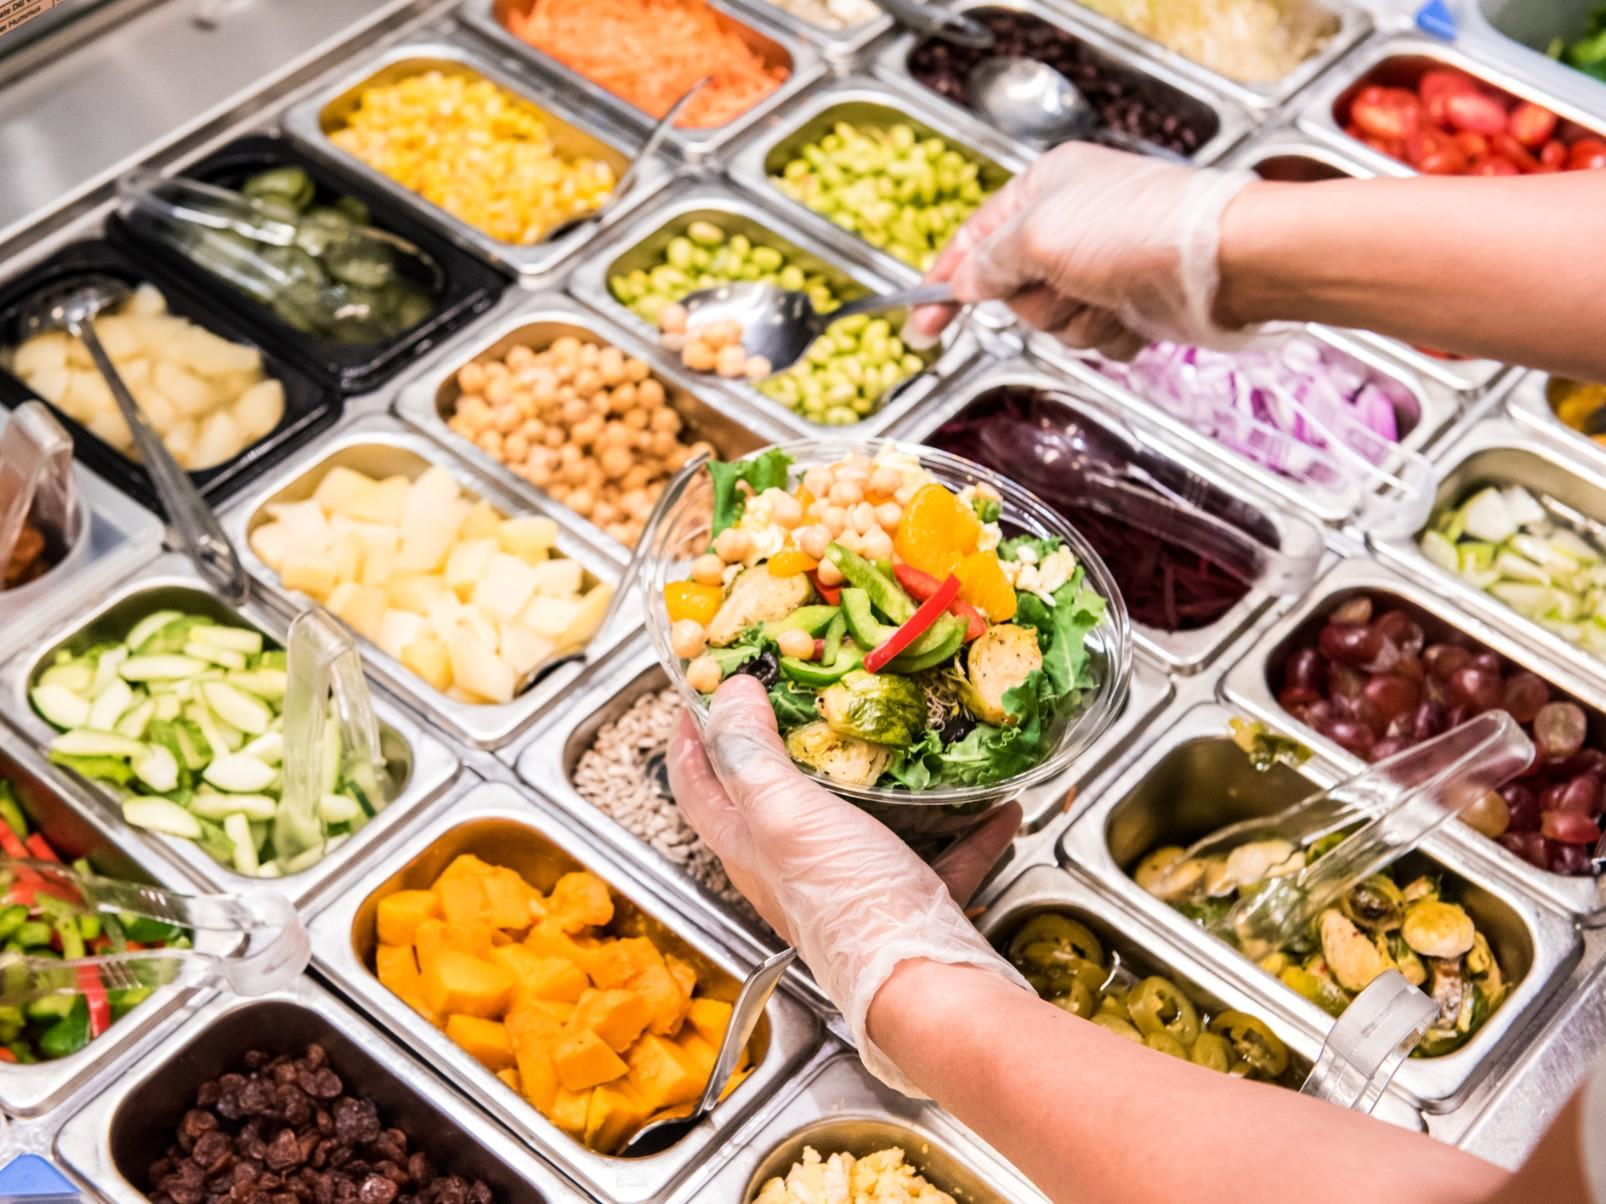 SaladStop! (TANGS at Tang Plaza) - Dine, Shop, Earn